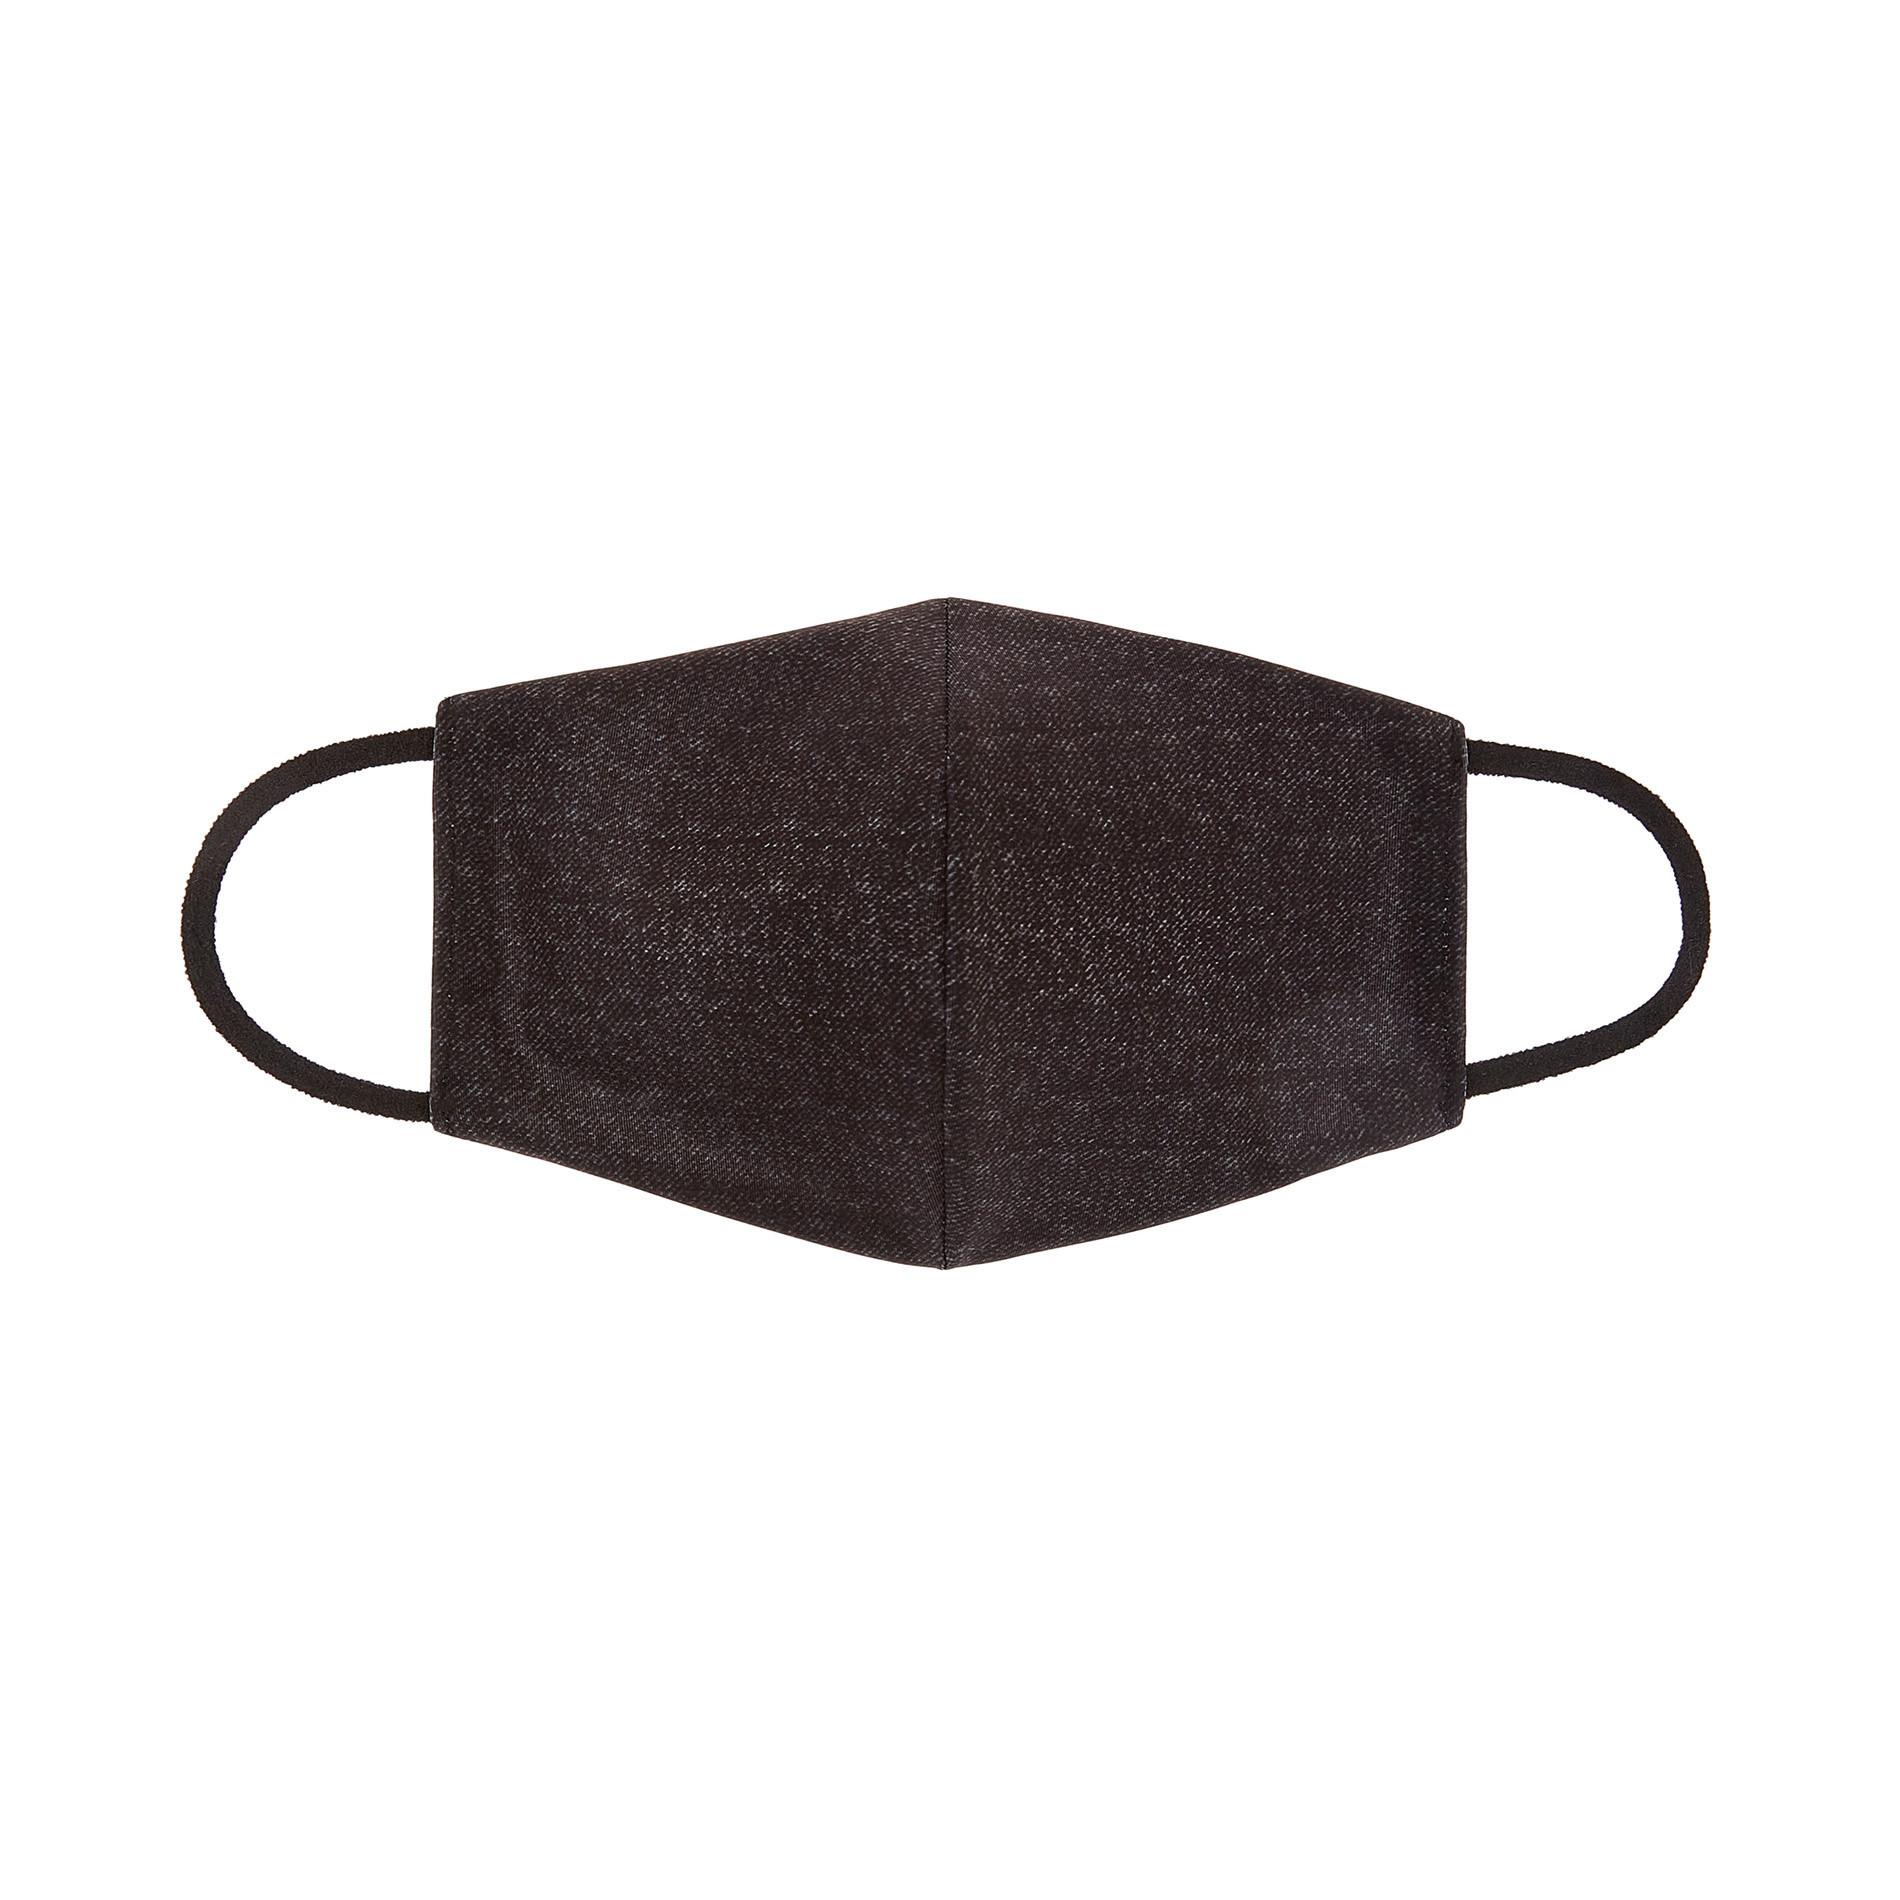 Mascherina lavabile tessuto denim nero, Nero, large image number 0